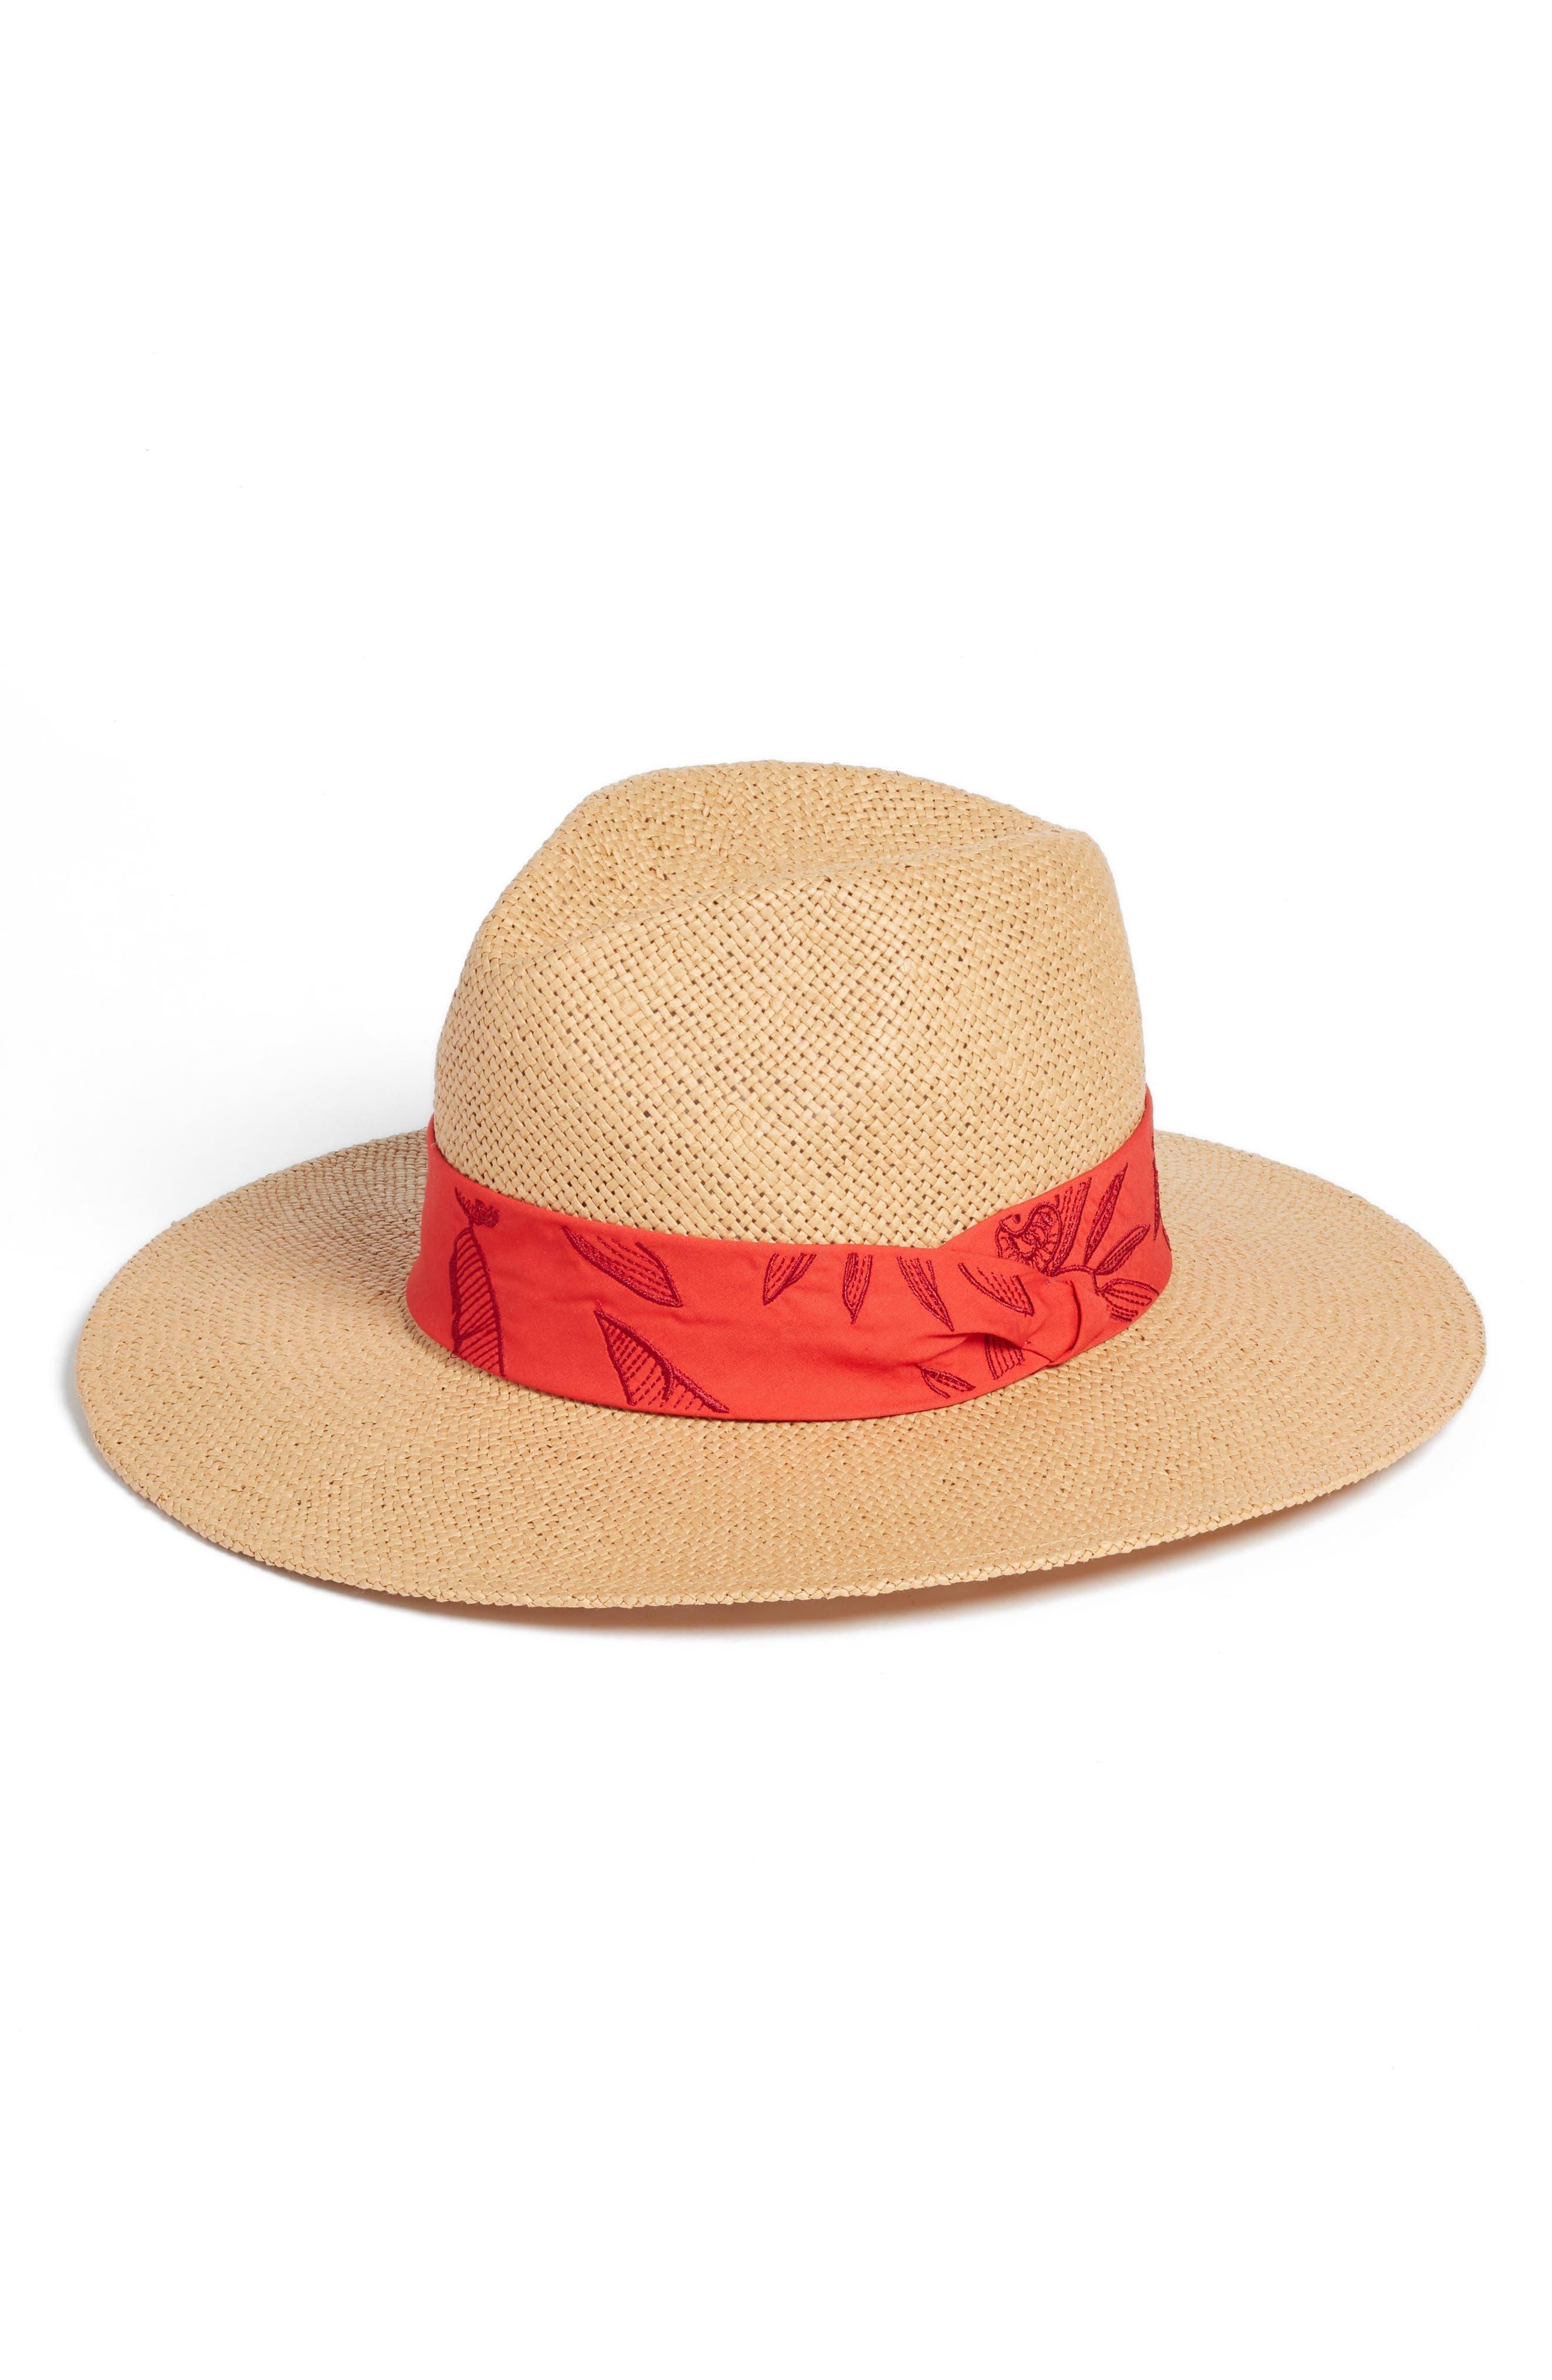 Nordstrom Modern Pop Straw Panama Hat